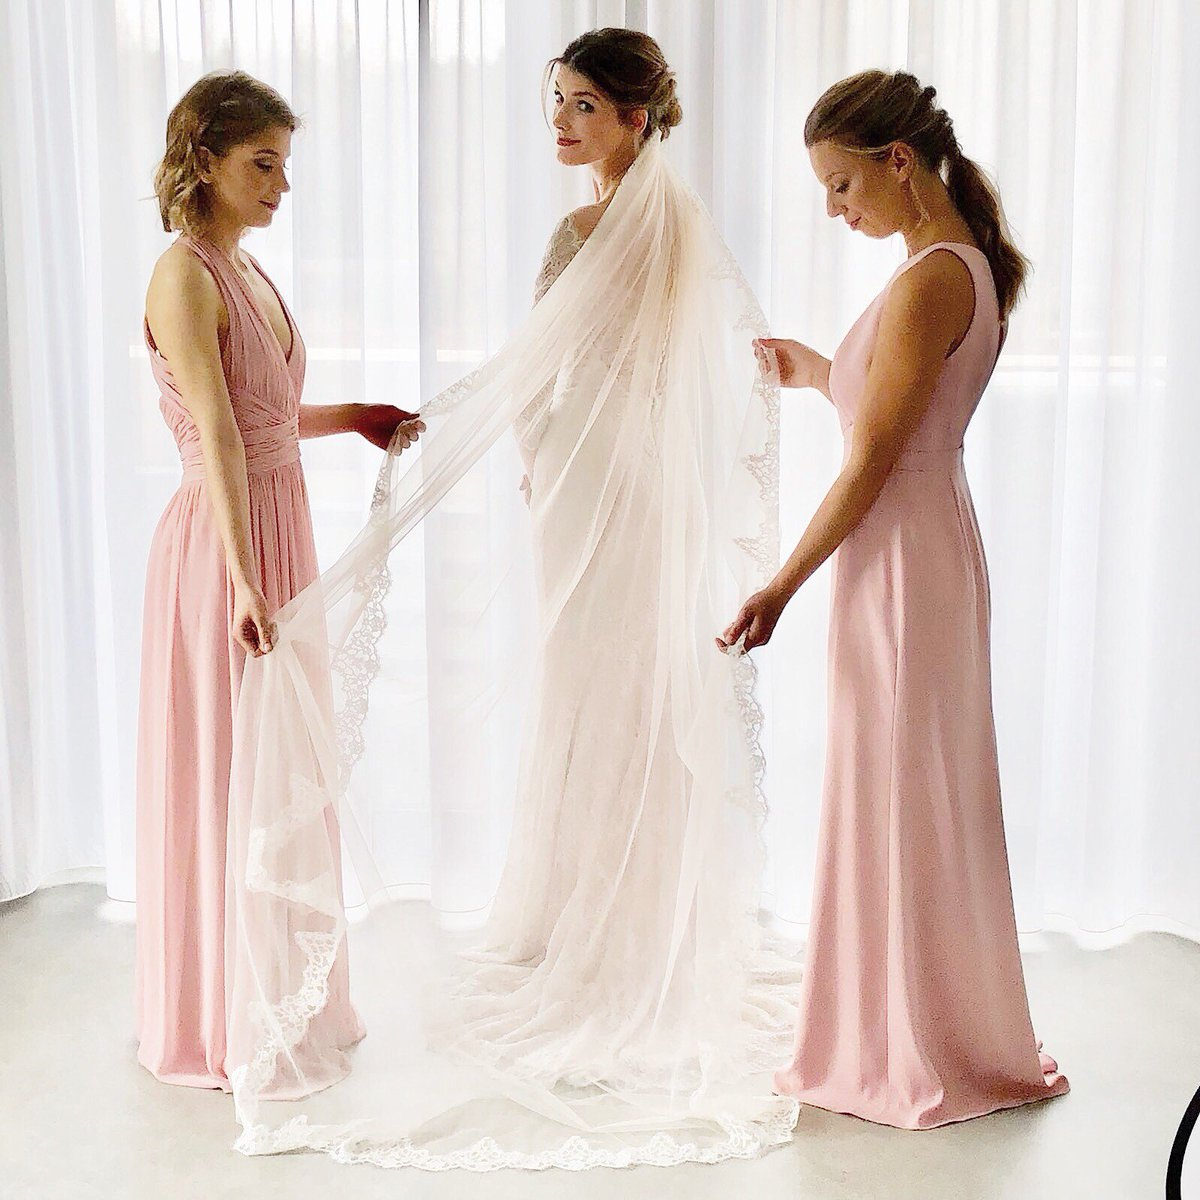 Nett Filipino Brautkleid Galerie - Brautkleider Ideen - cashingy.info